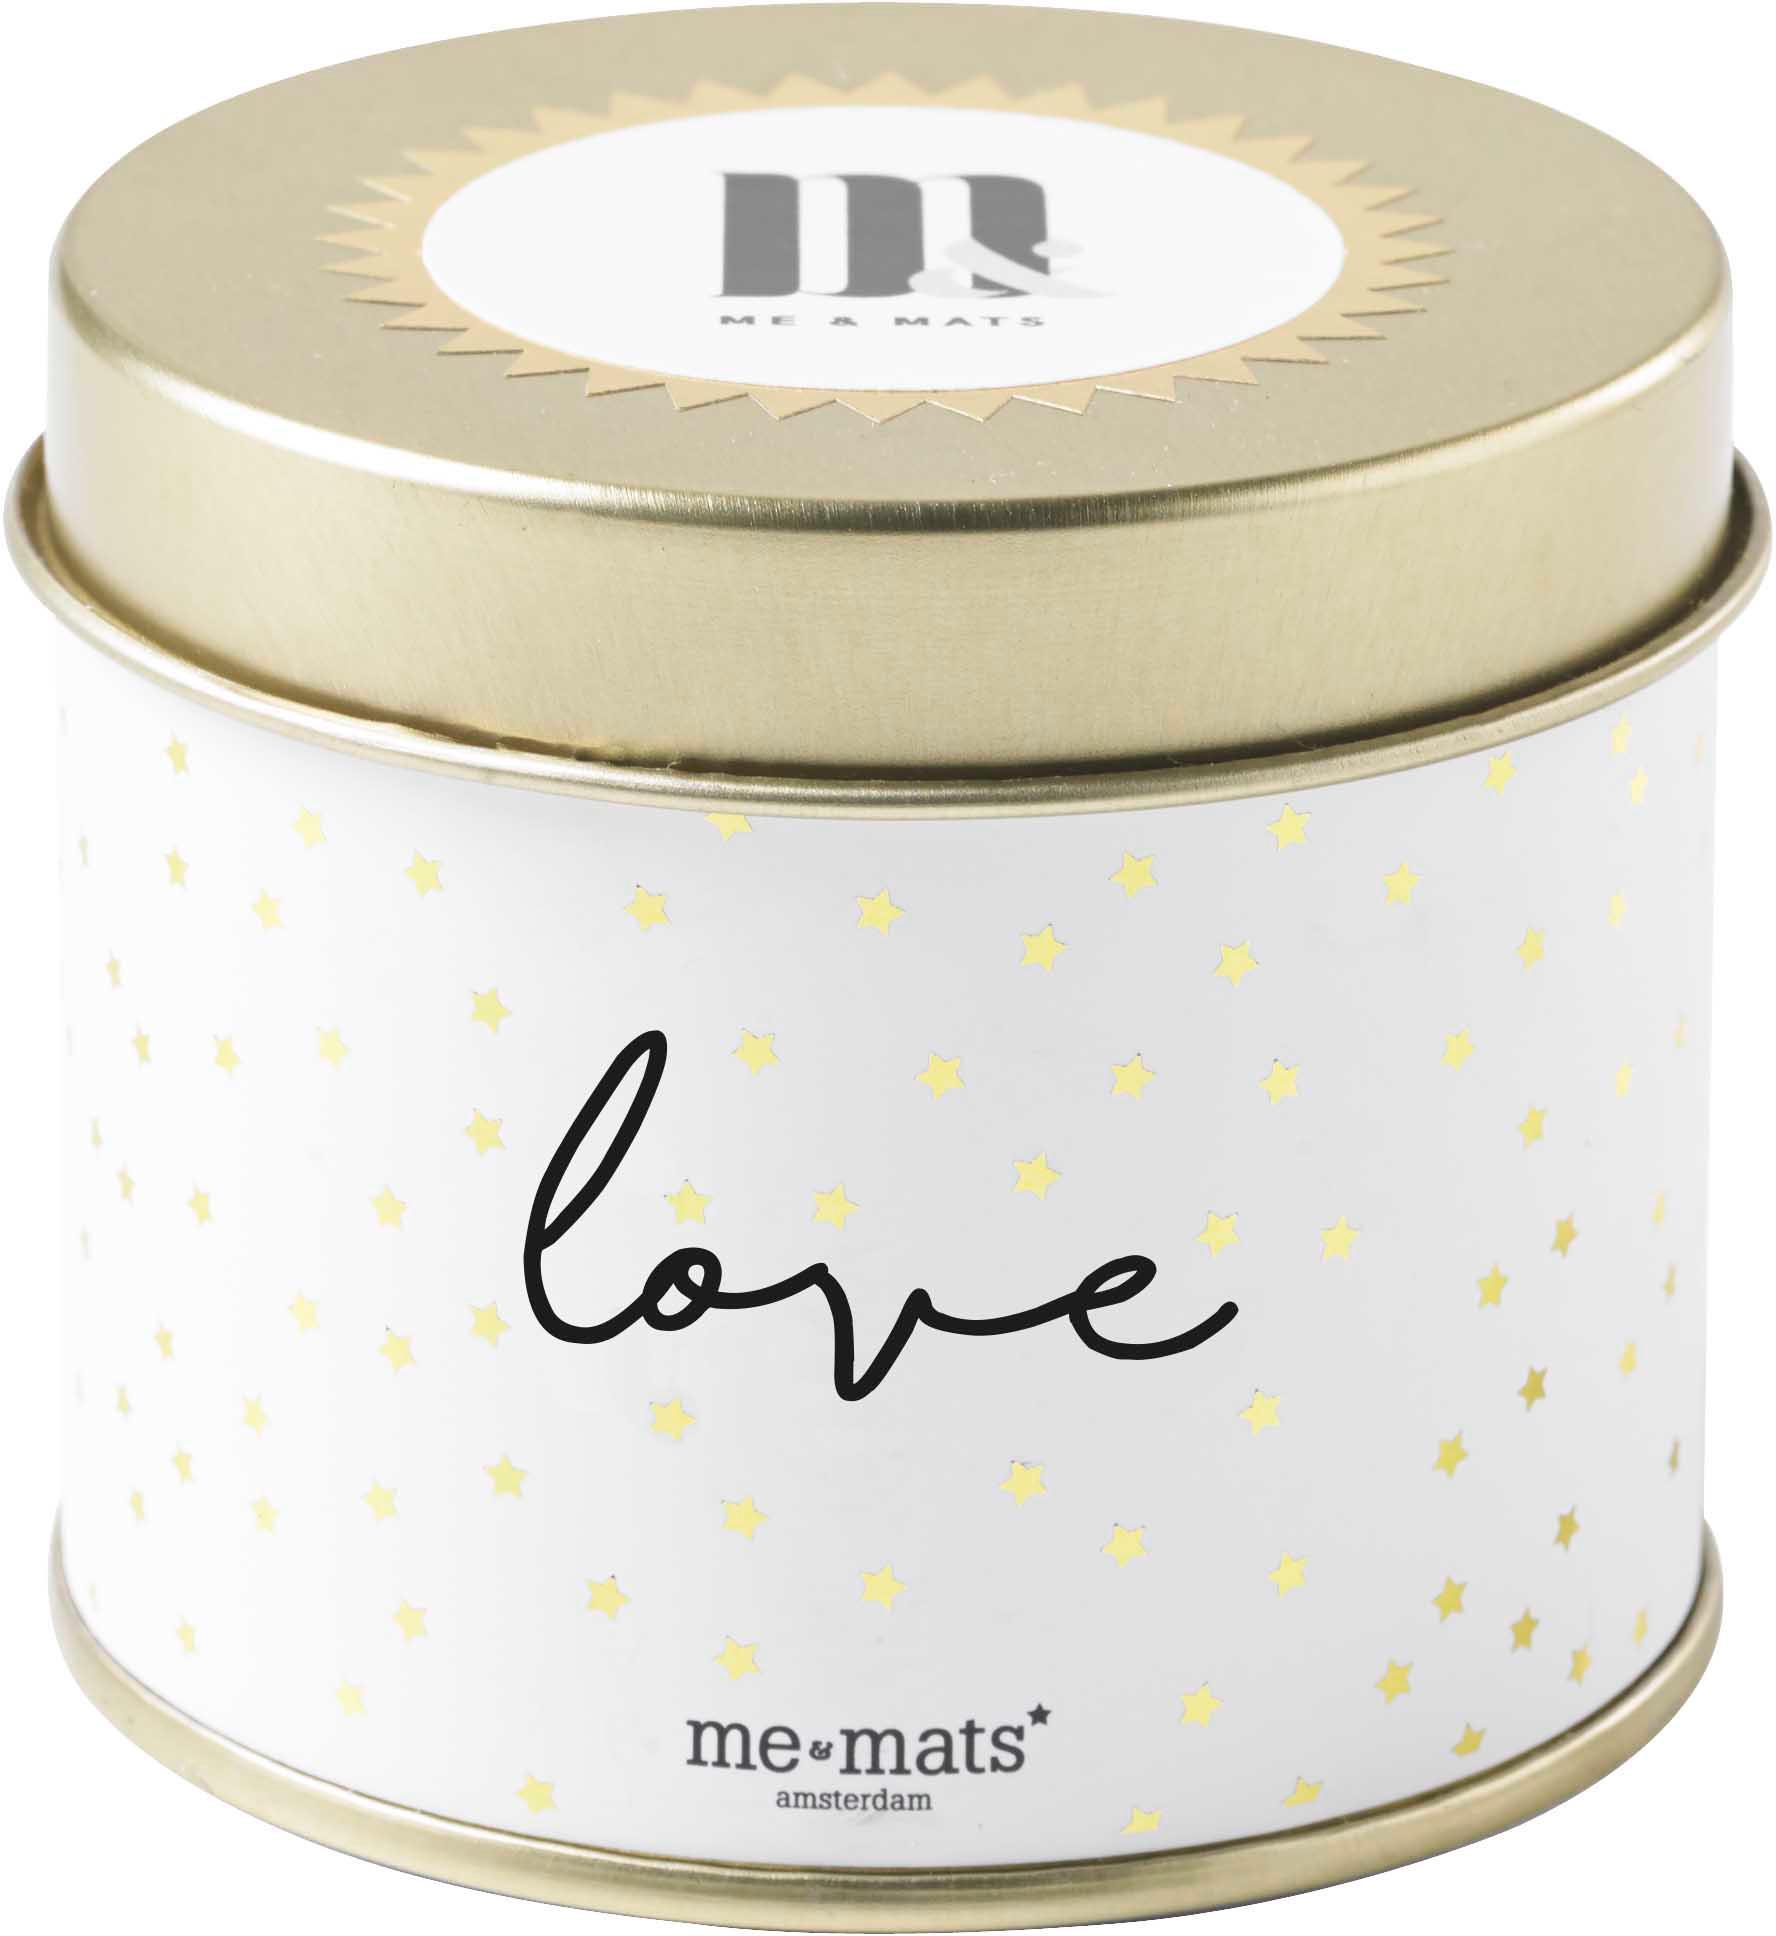 Duftkerze Love (Grapefruit, Patschuli & Wassermelone), Behälter: Metall, beschichtet, Goldfarben, Weiß, Schwarz, Ø 8 x H 7 cm